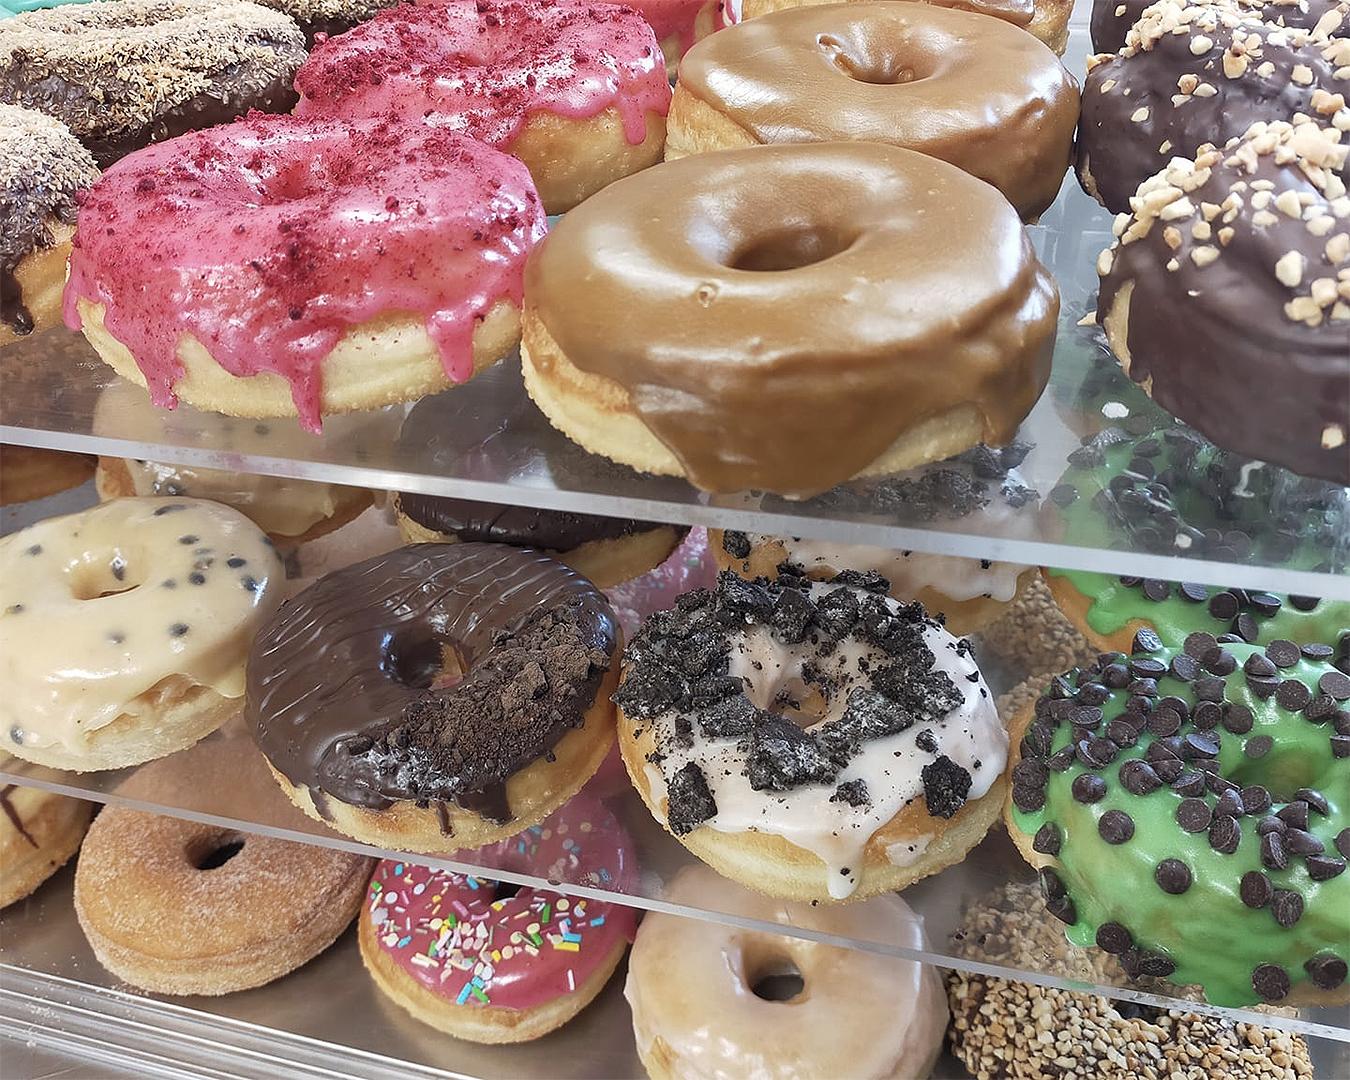 A dizzying array of doughnuts at Doughnut Haus.